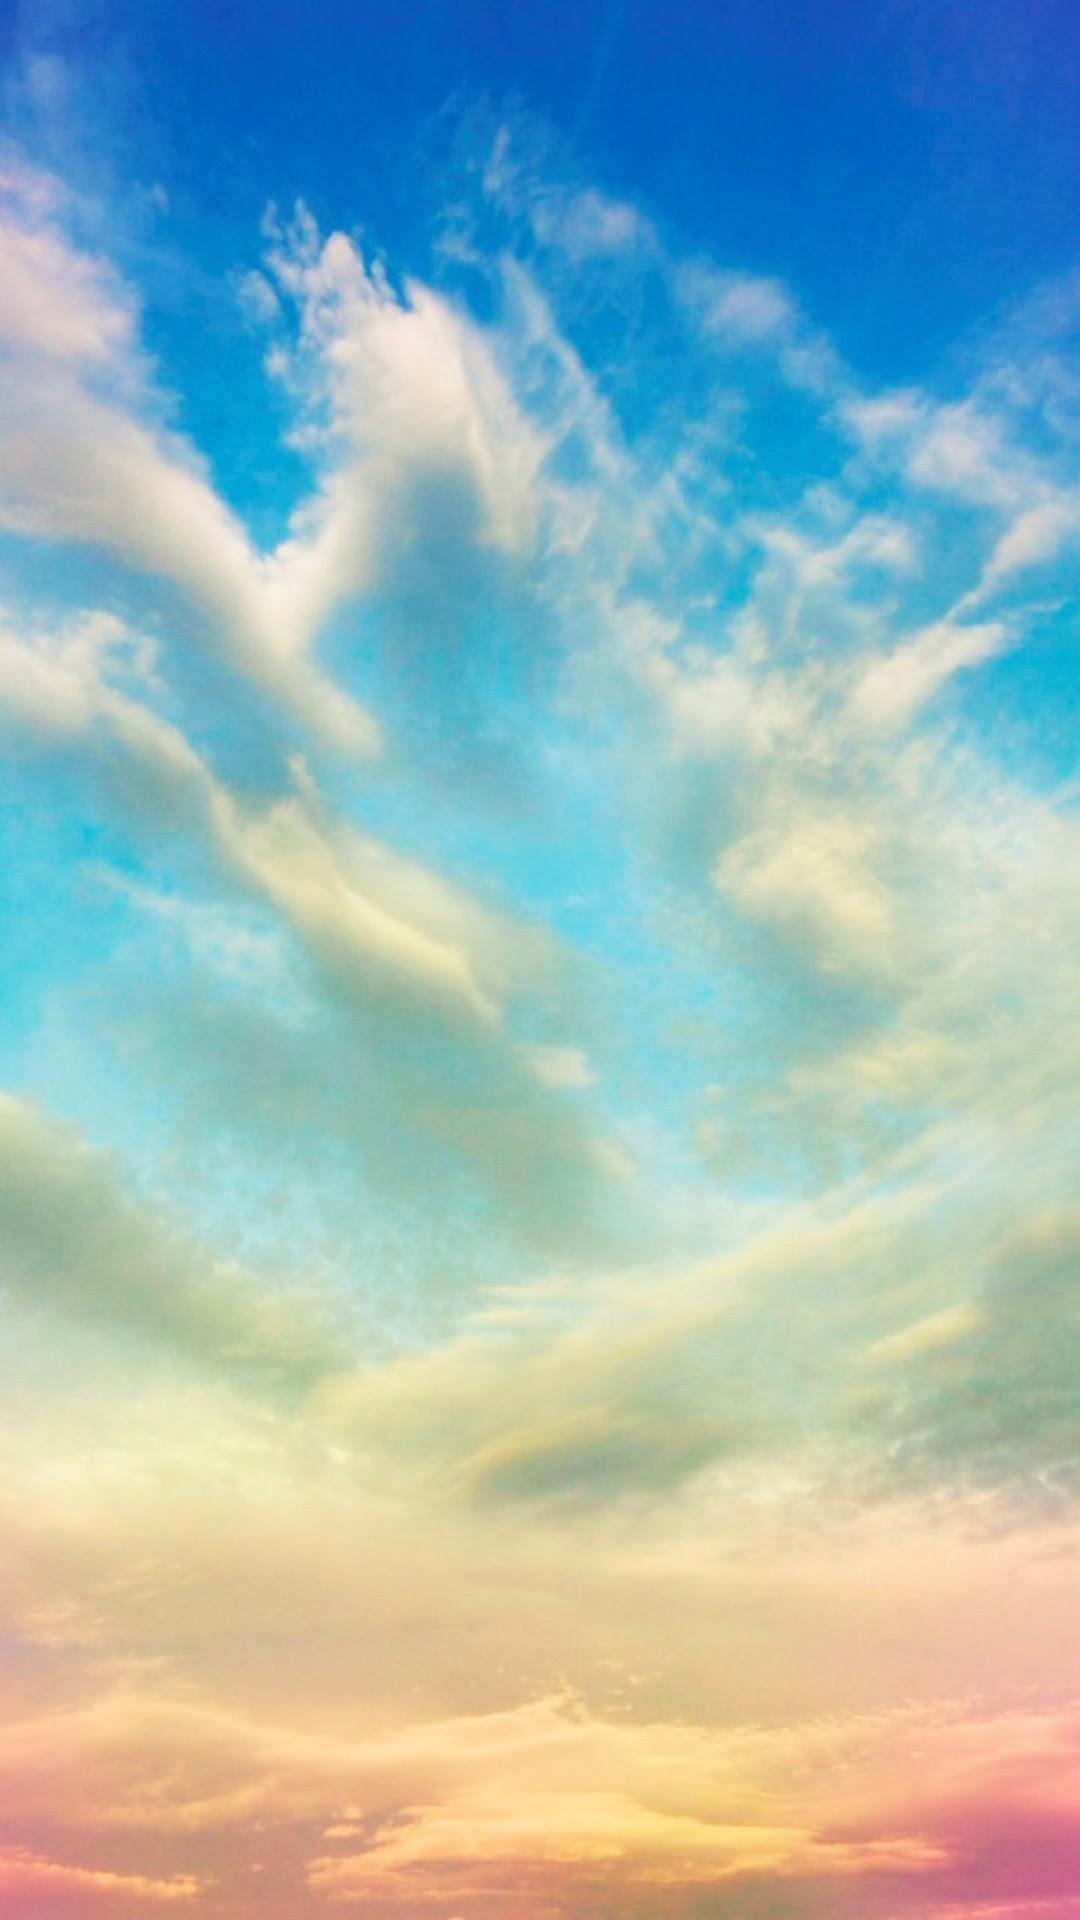 Clouds iPhone Backgrounds Free Download | PixelsTalk.Net